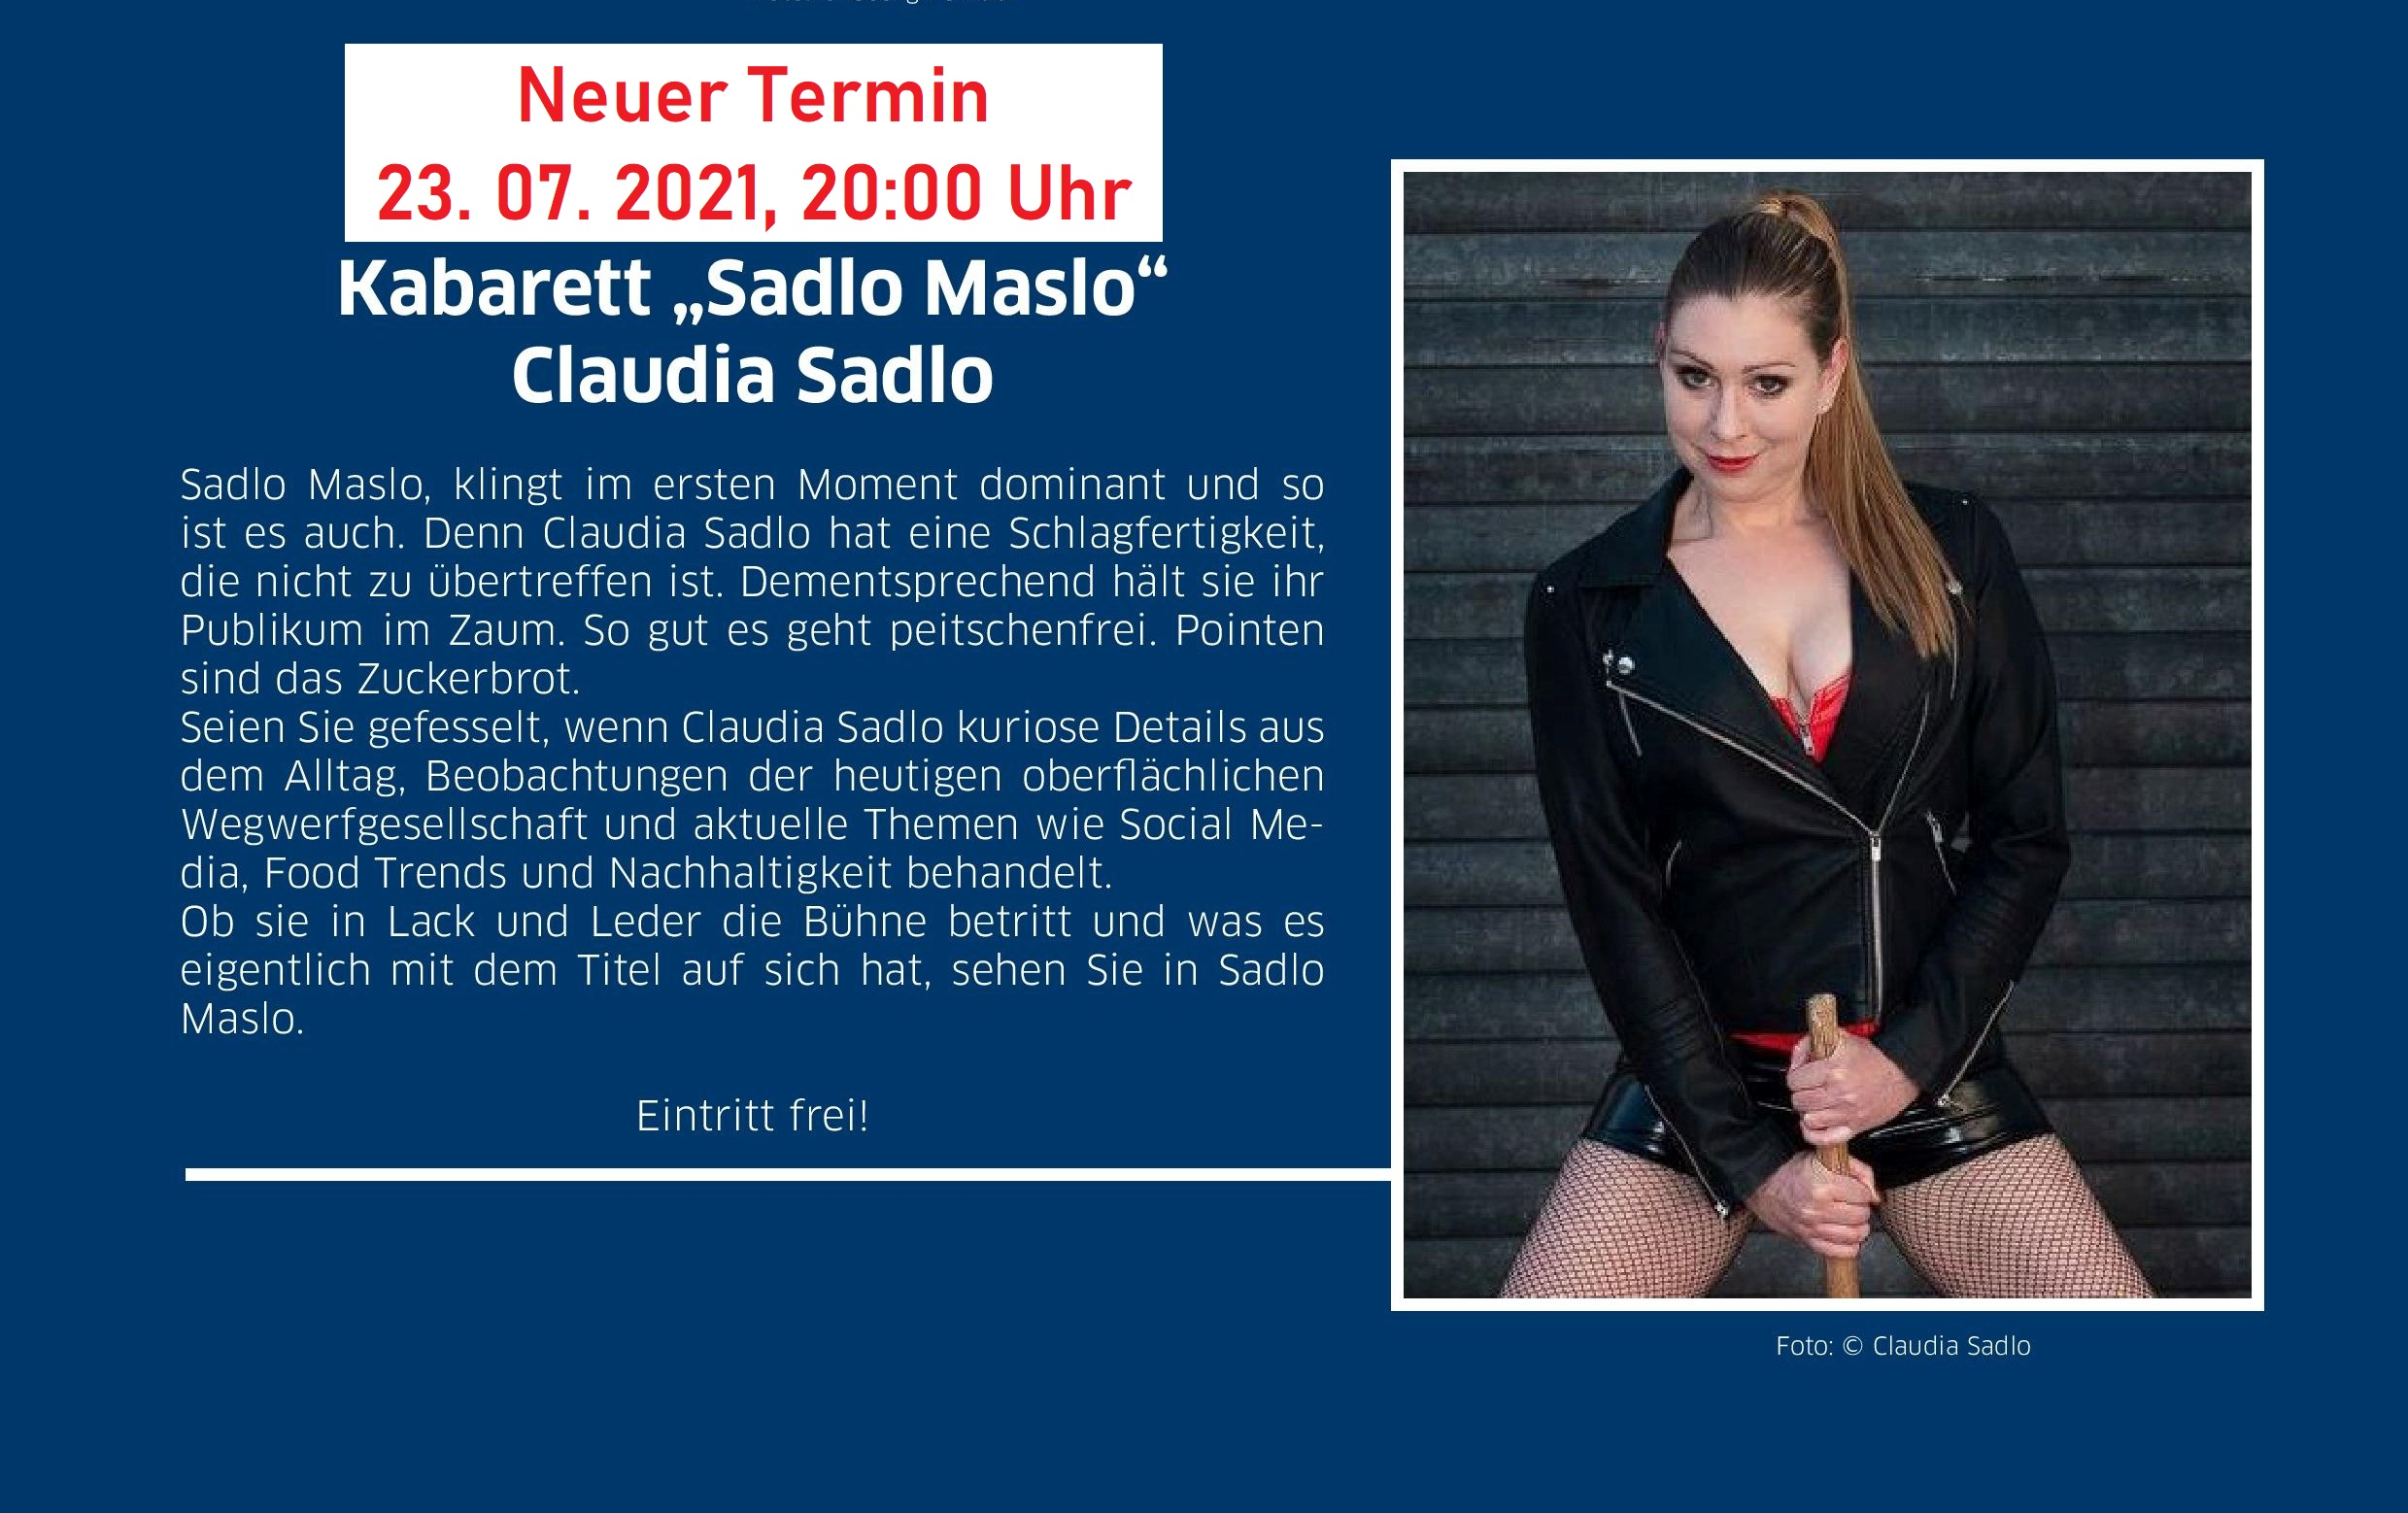 Claudia Sadlo neuer Termin